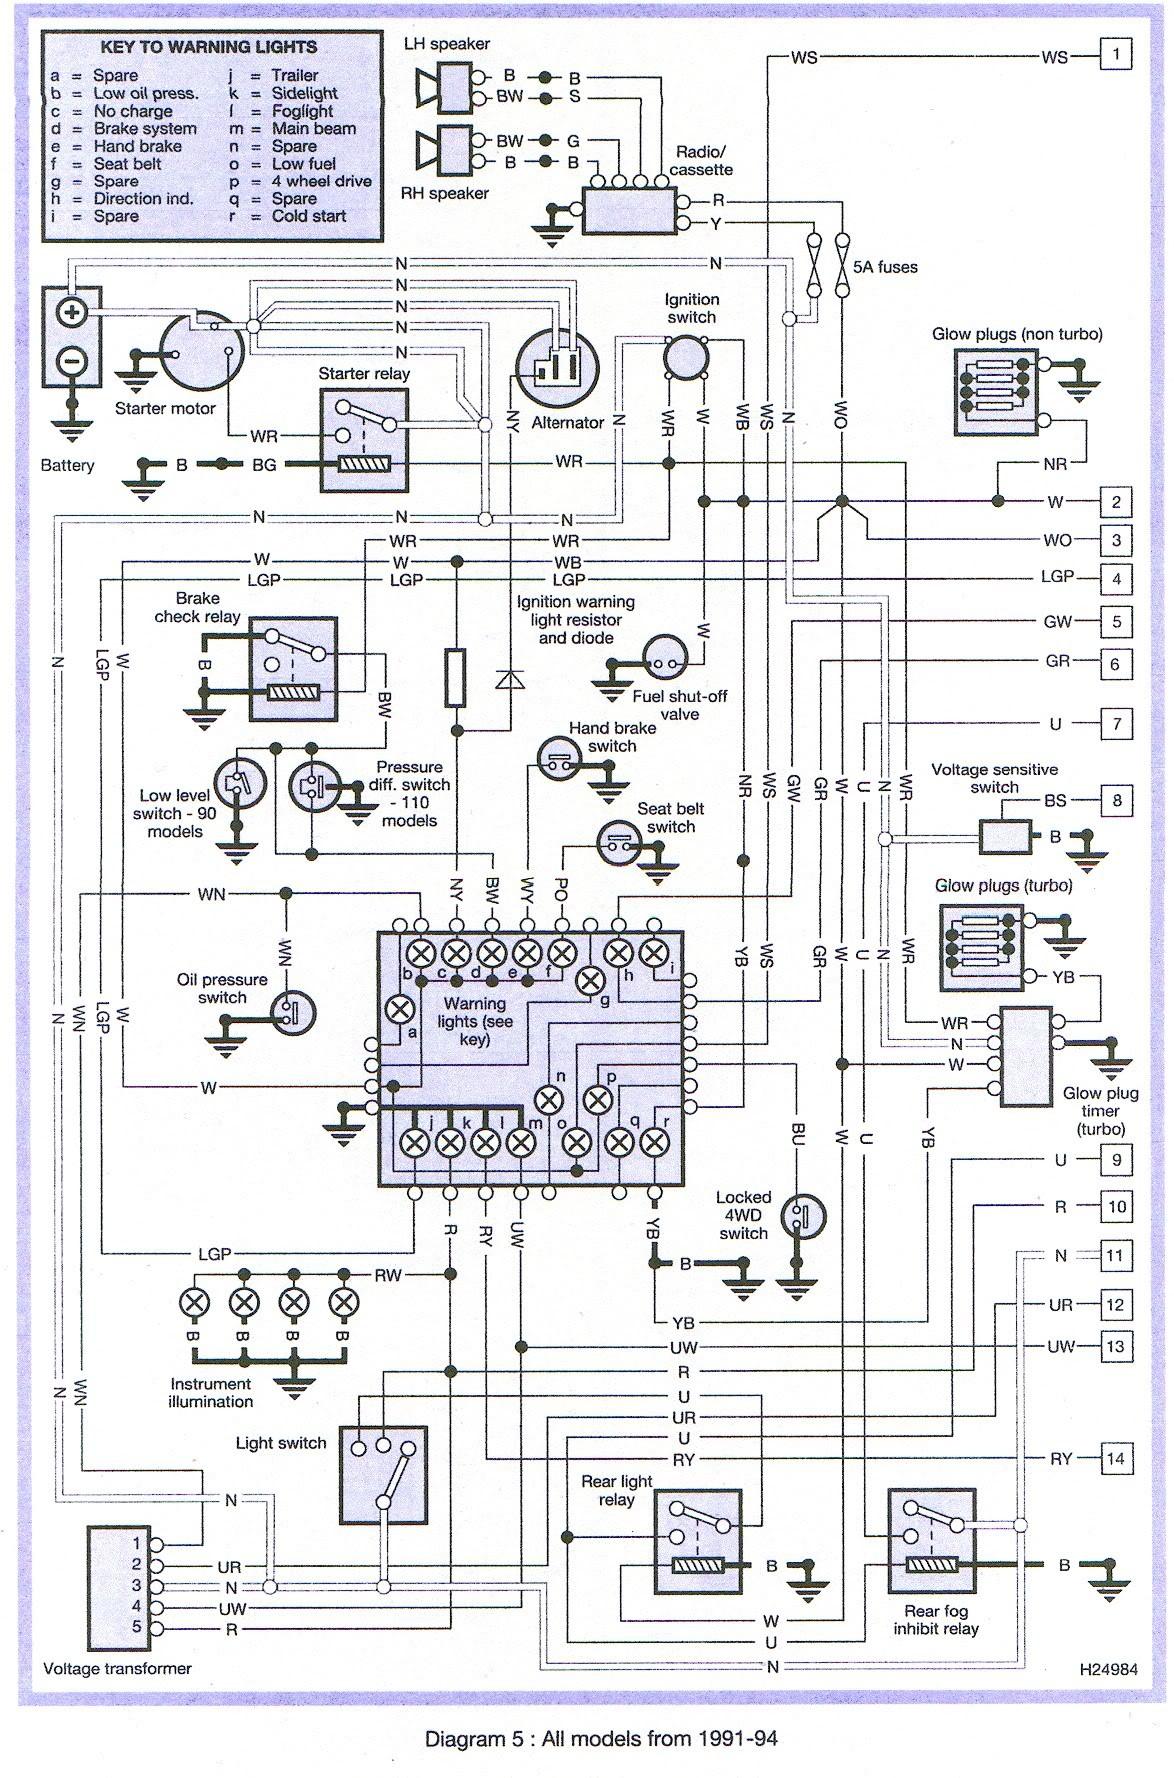 Diagrama Electricio De Land Rover Discovery 2003 Diagram] Land Rover Lights Wiring Diagram Full Version Hd